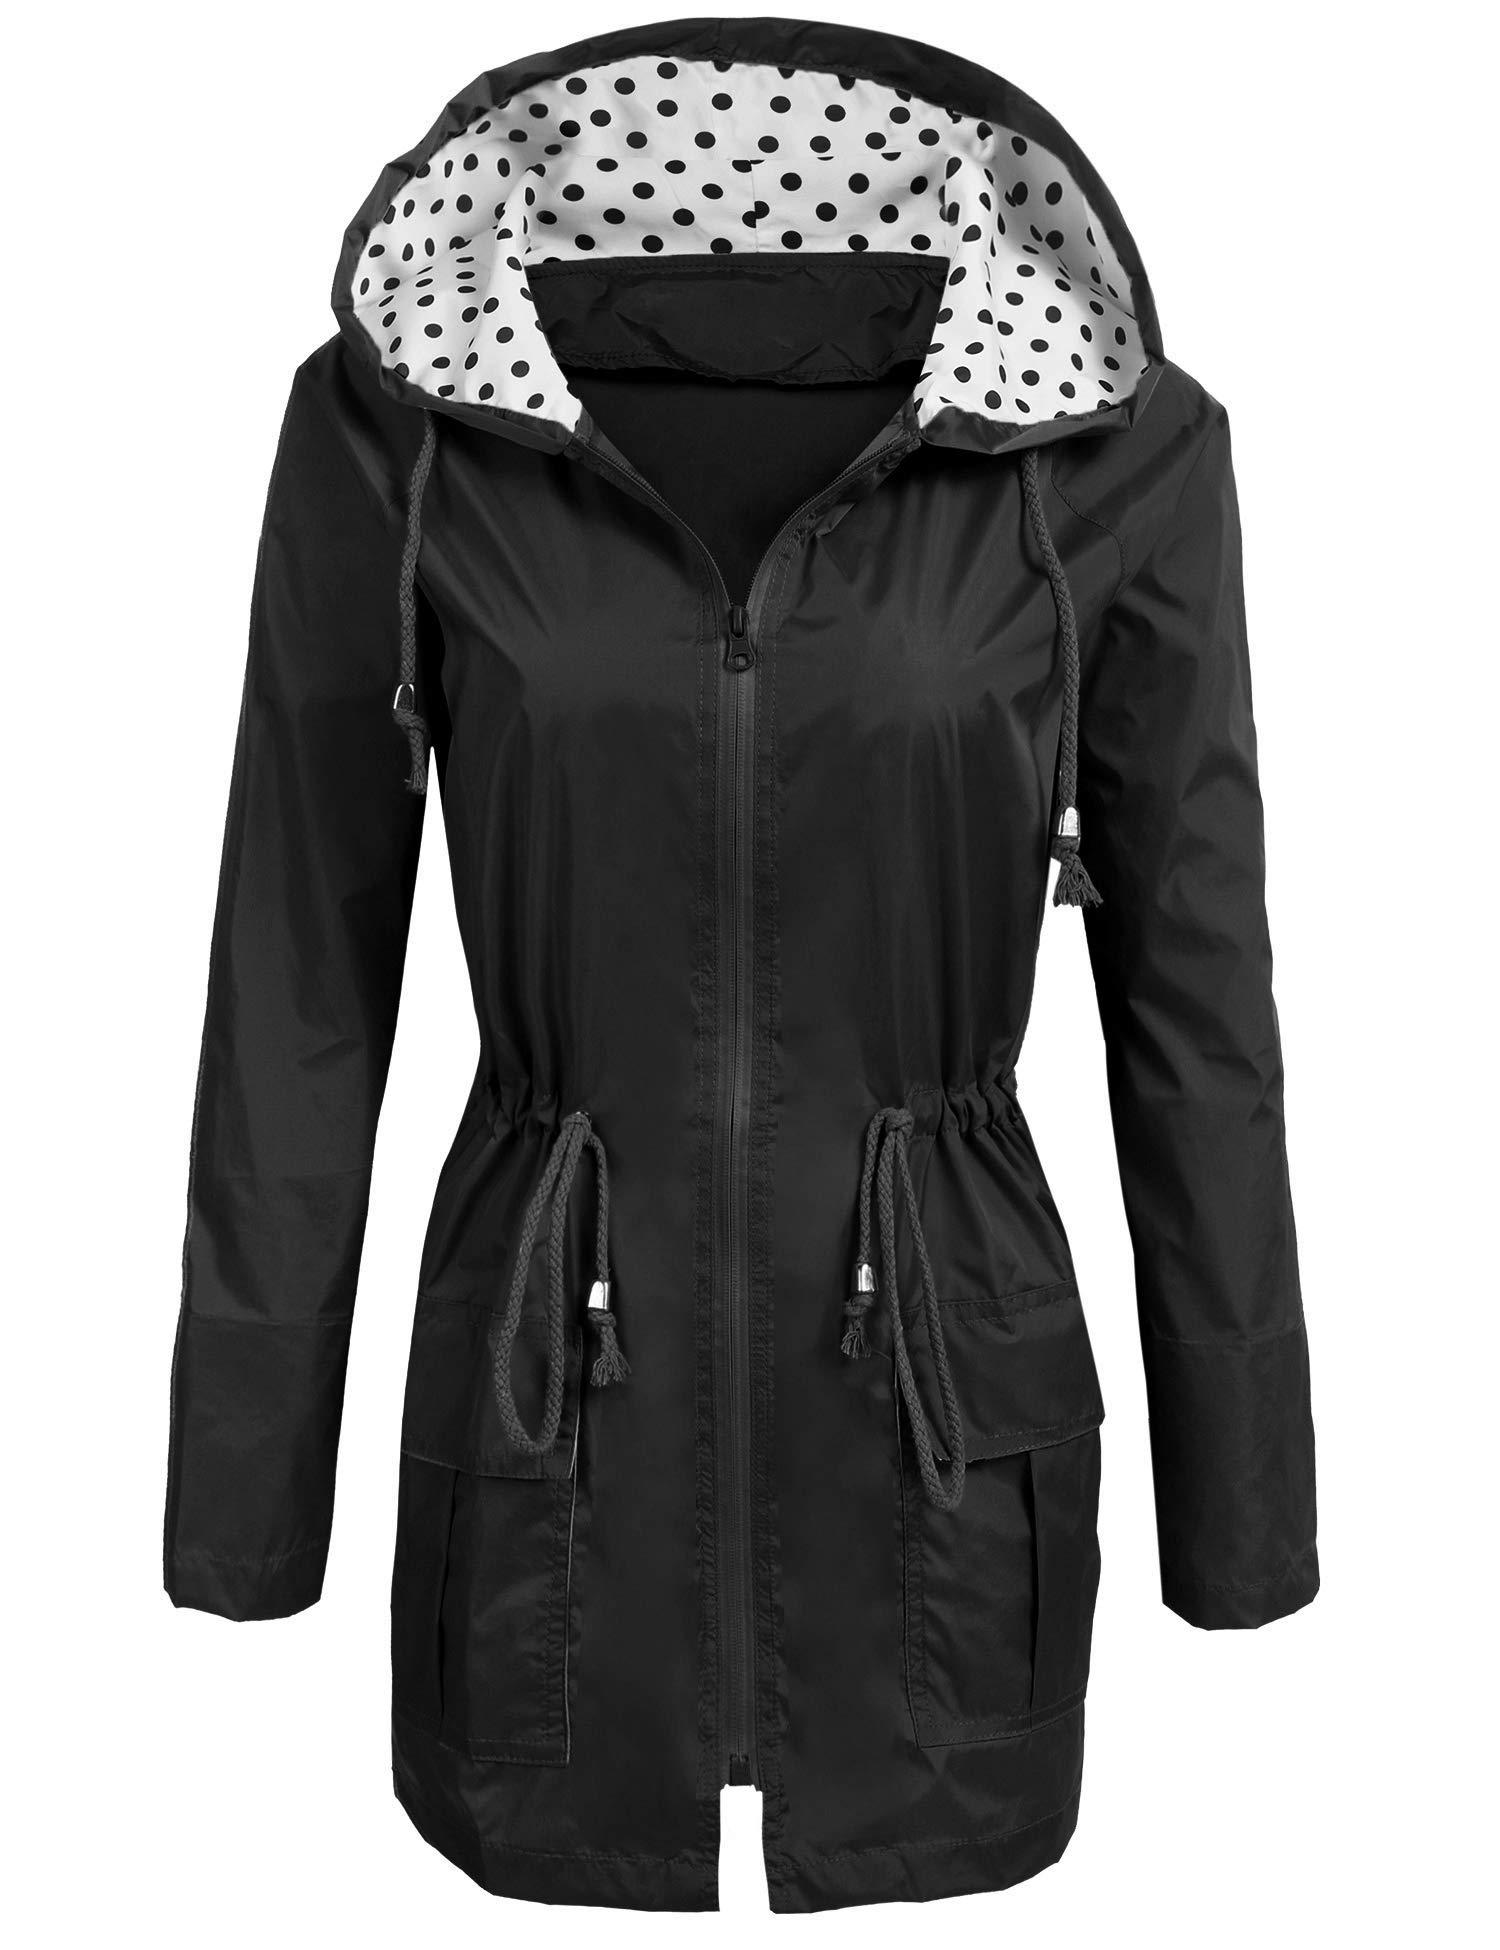 Soteer Rain Jacket Women's Waterproof Raincoat with Hood Lightweight Packable Ladies Outdoor Hooded Windbreaker